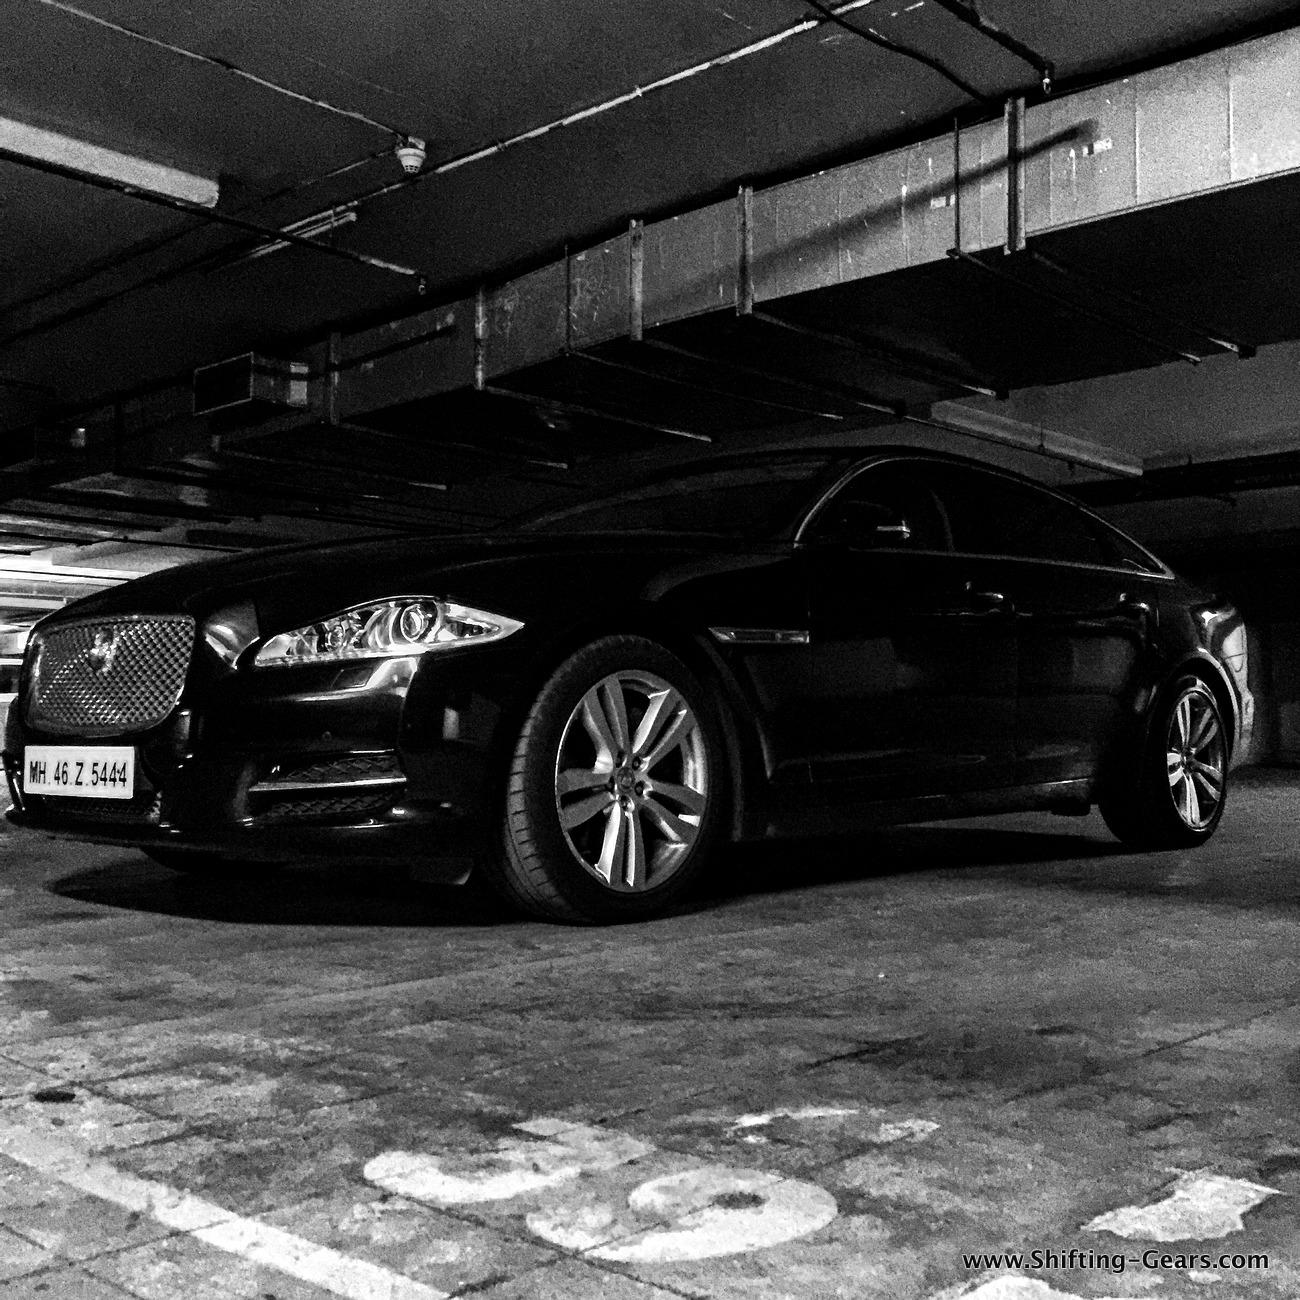 jaguar-xj-l-review-13